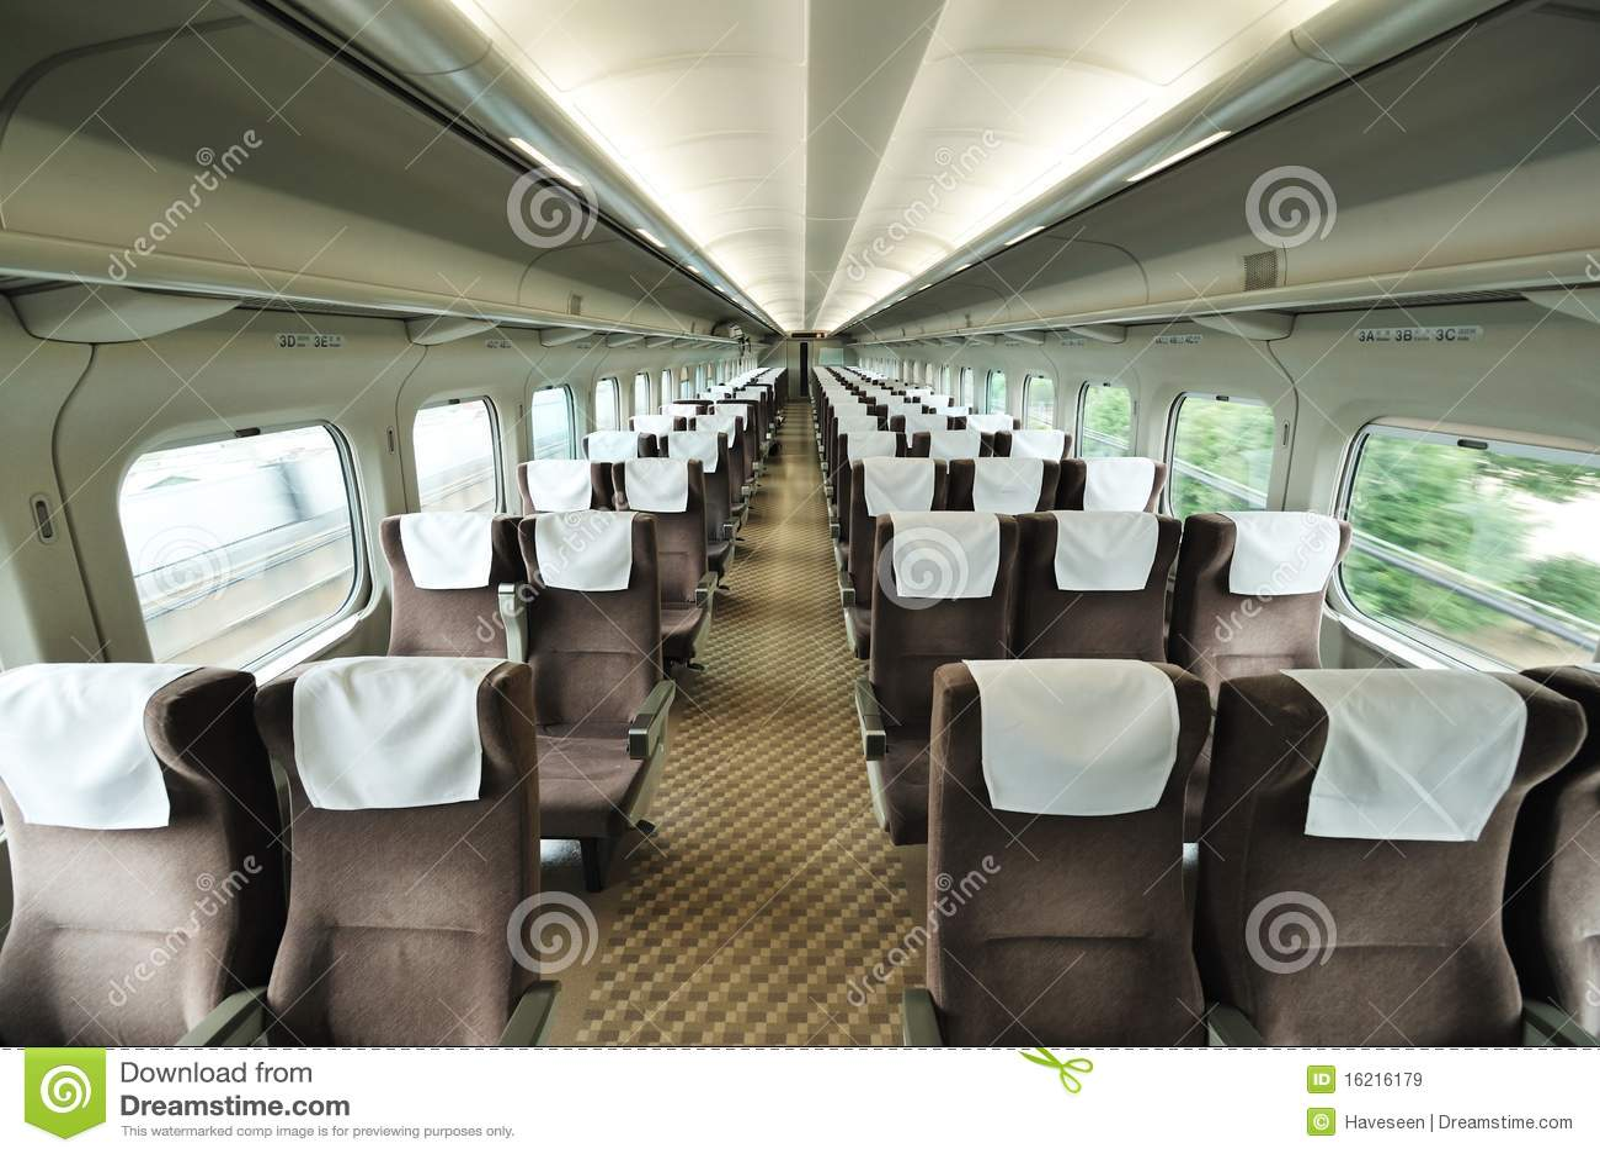 train car seat royalty free stock images image 16216179. Black Bedroom Furniture Sets. Home Design Ideas